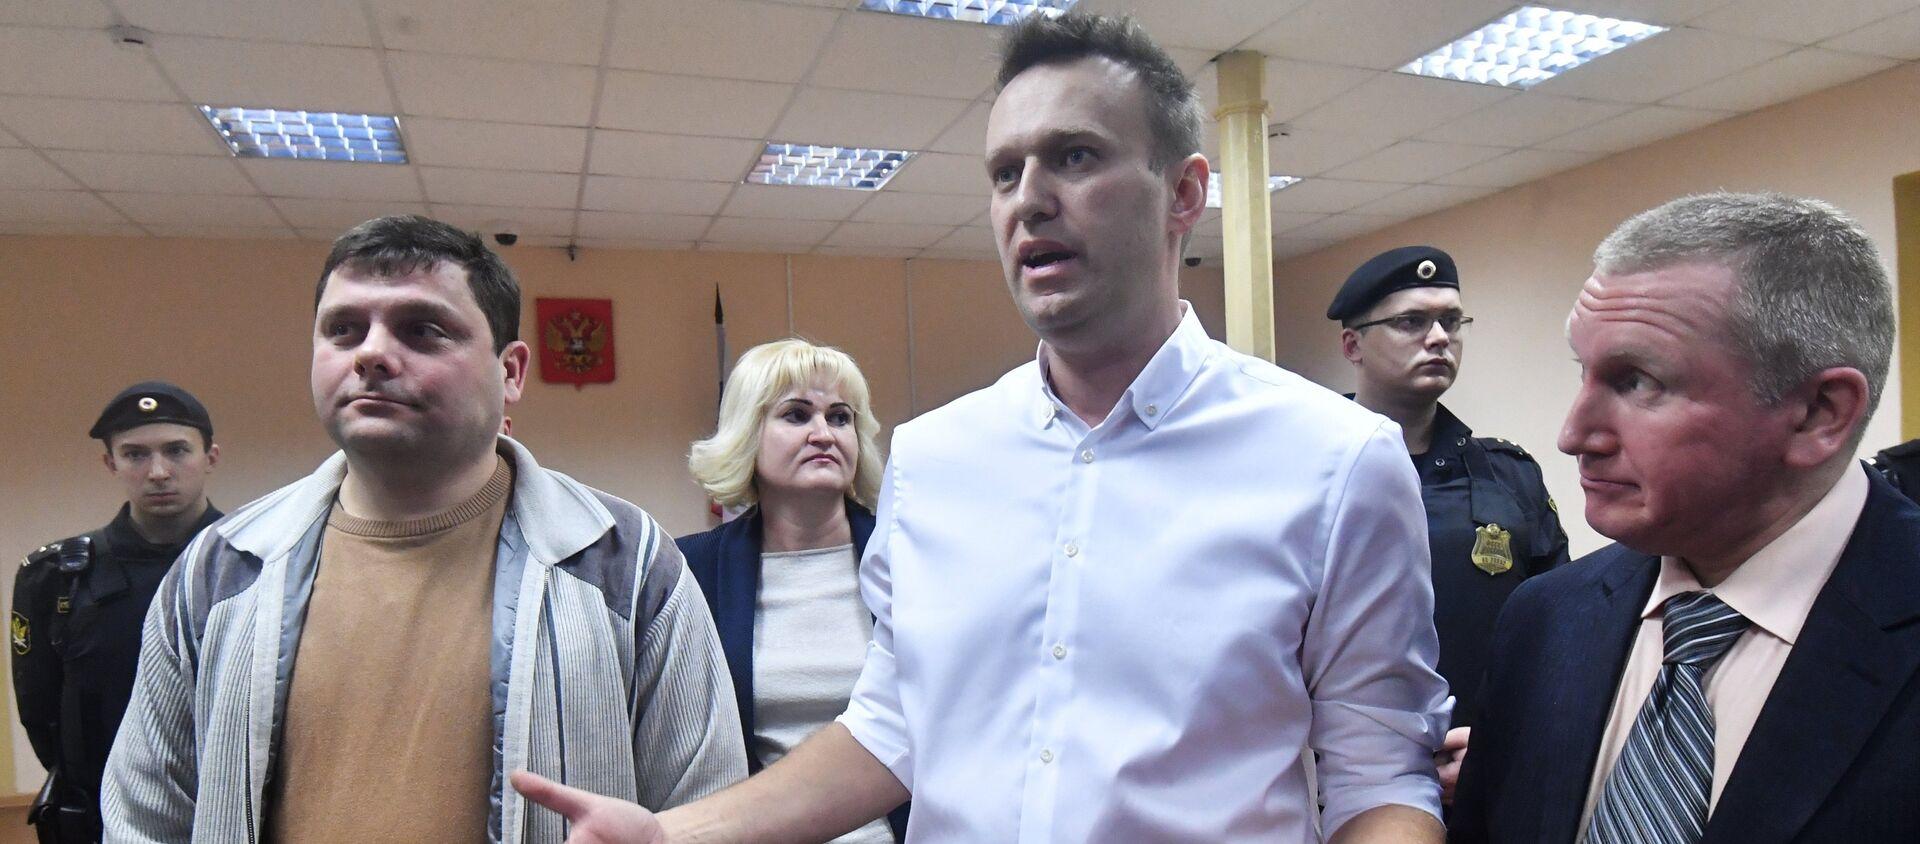 Ruský bloger Alexej Navalnyj - Sputnik Česká republika, 1920, 05.02.2021